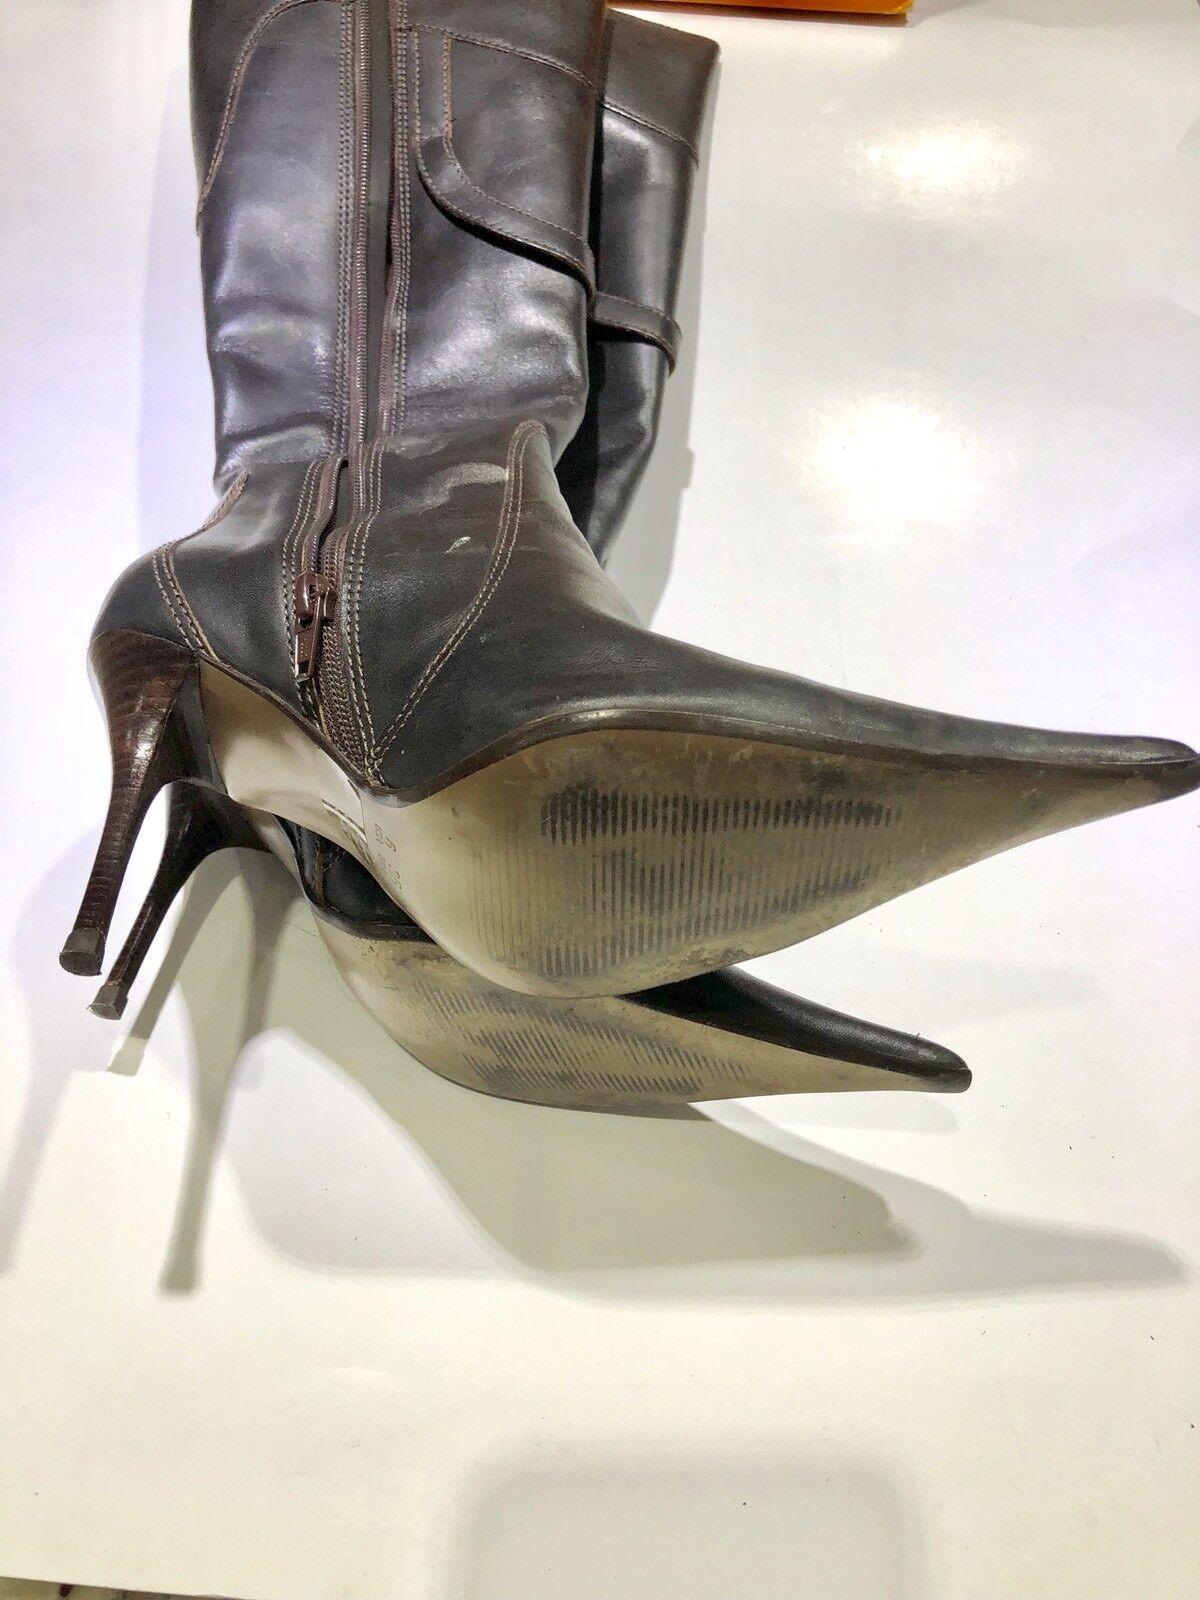 Mixx Damens's High 6 Braun Leder Stiefel Größe 6 High 6ada62